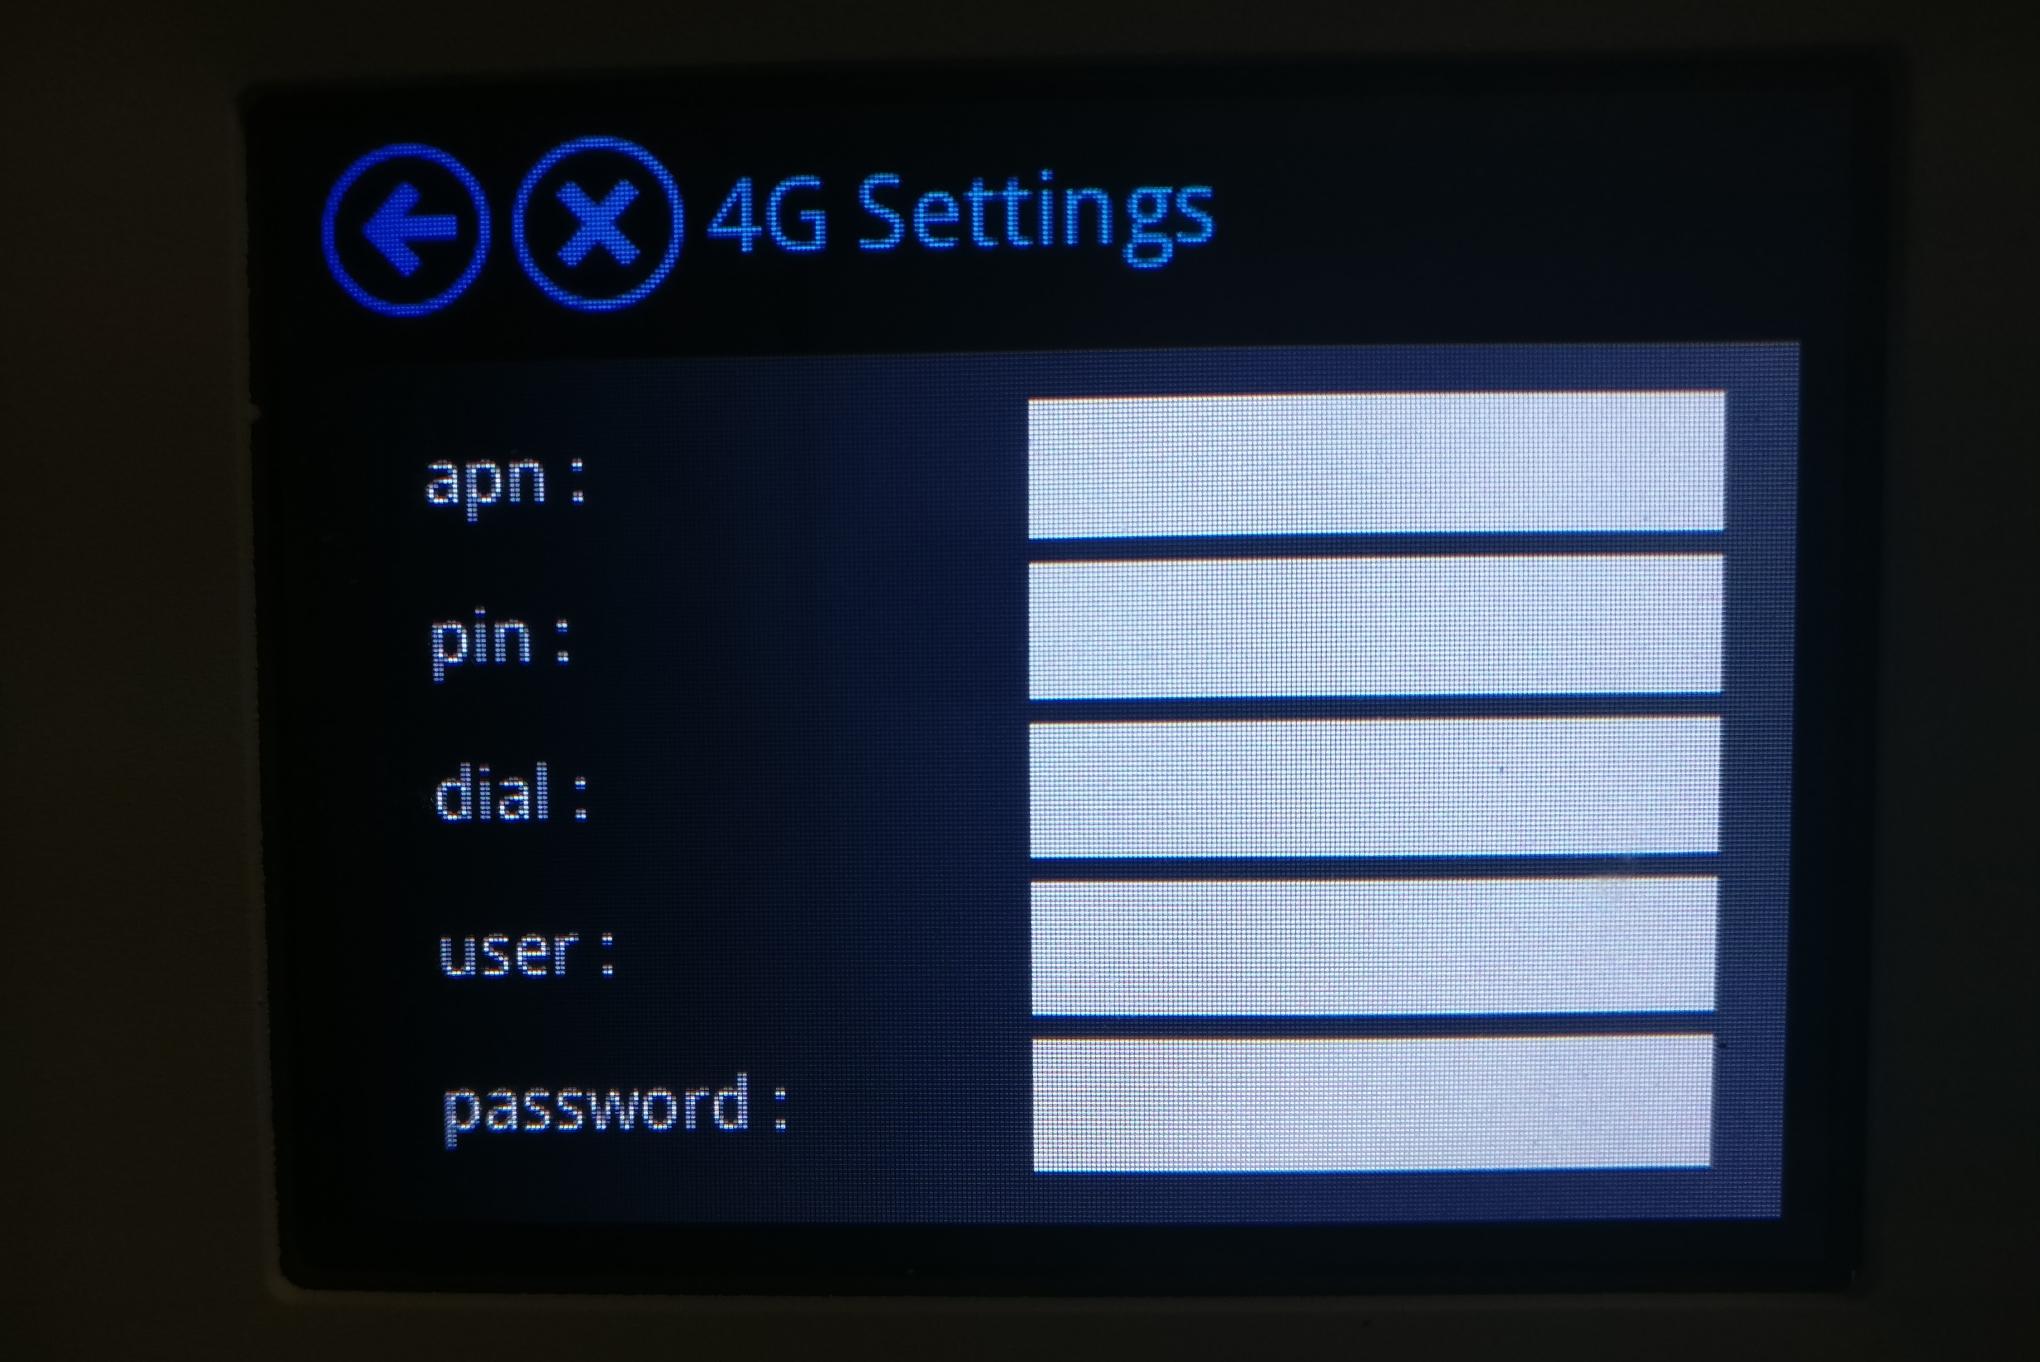 Securifi Almond Guard DIY Home Security System: A Beta-Testing Report